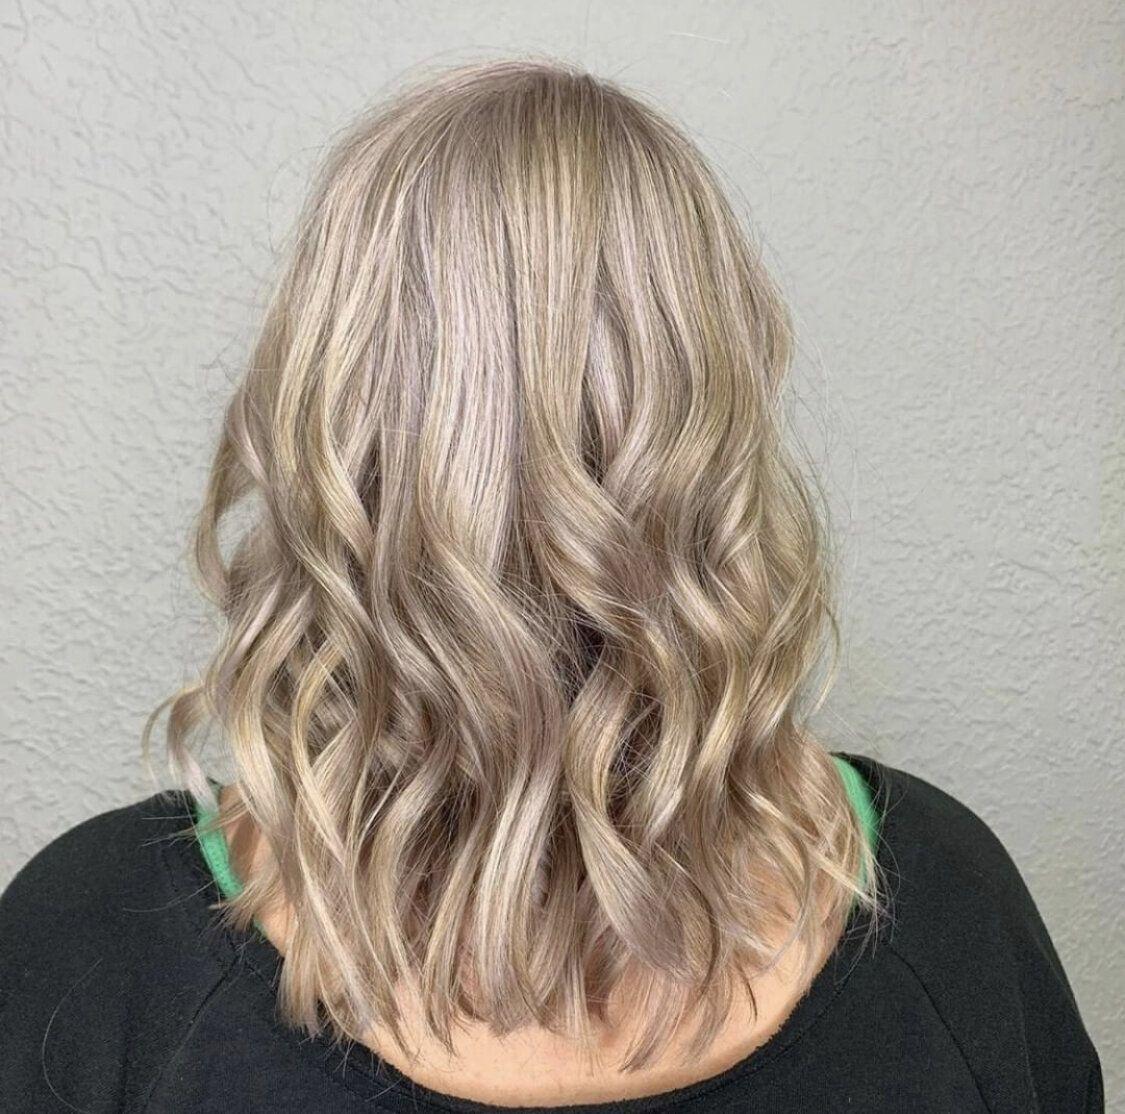 Curly Hairstyles Utah Hair Salon Rambut Panjang Balayage Rambut Keriting